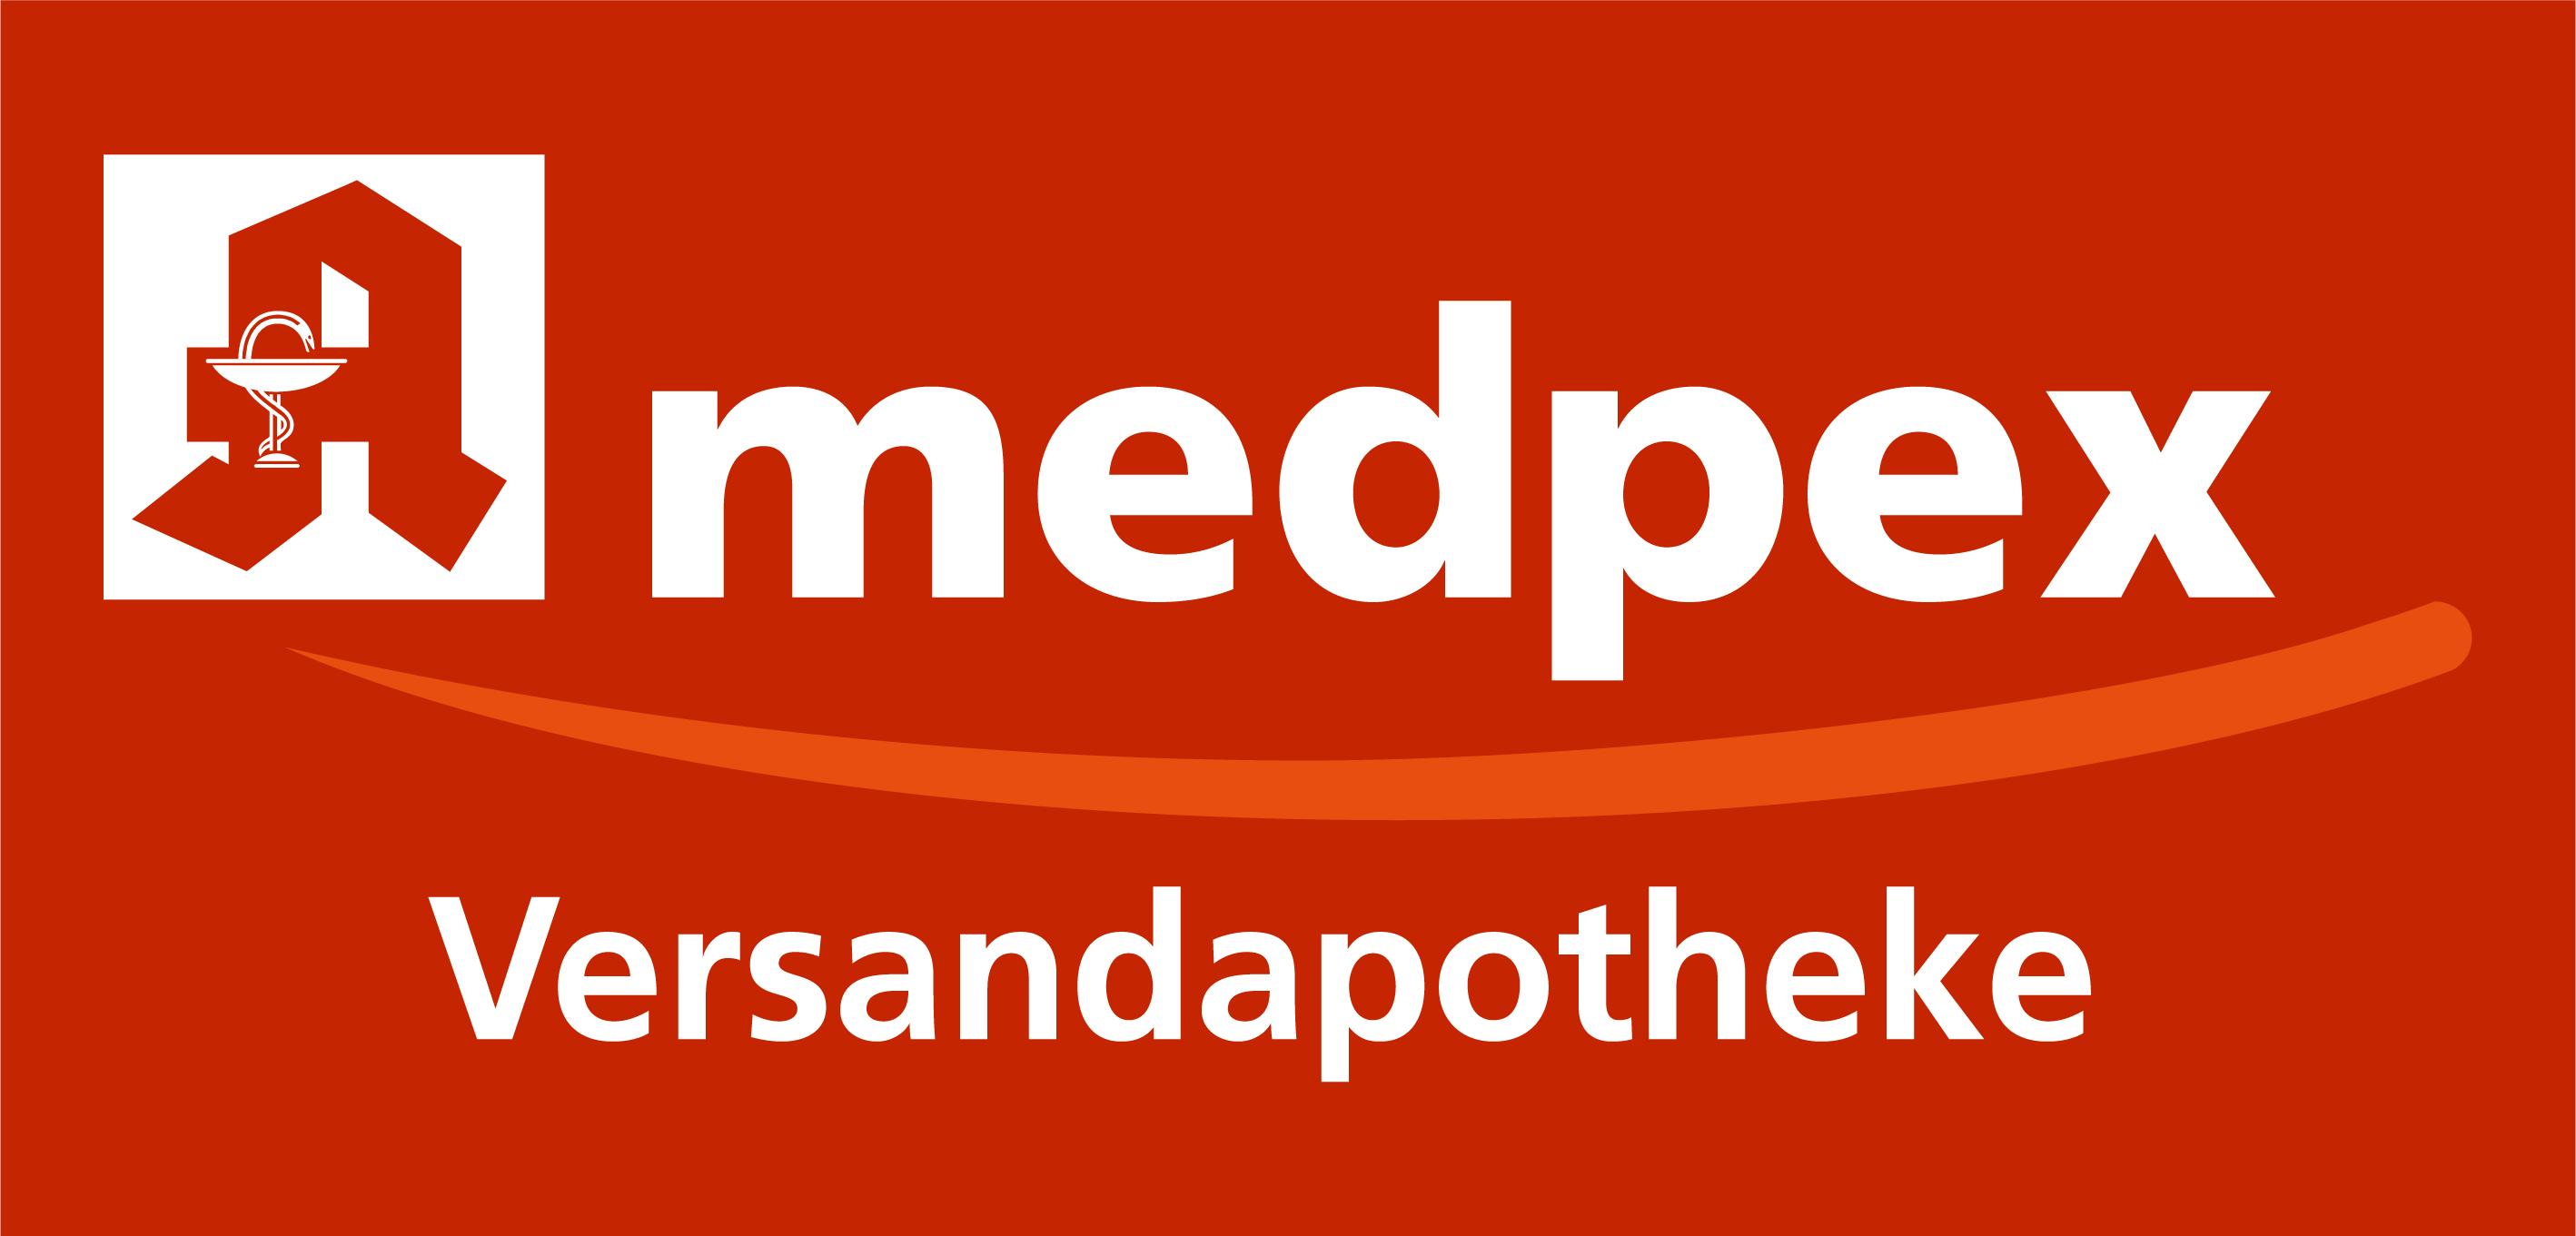 Id No 9105066328 Medpex Versandapotheke Stifts Apotheke